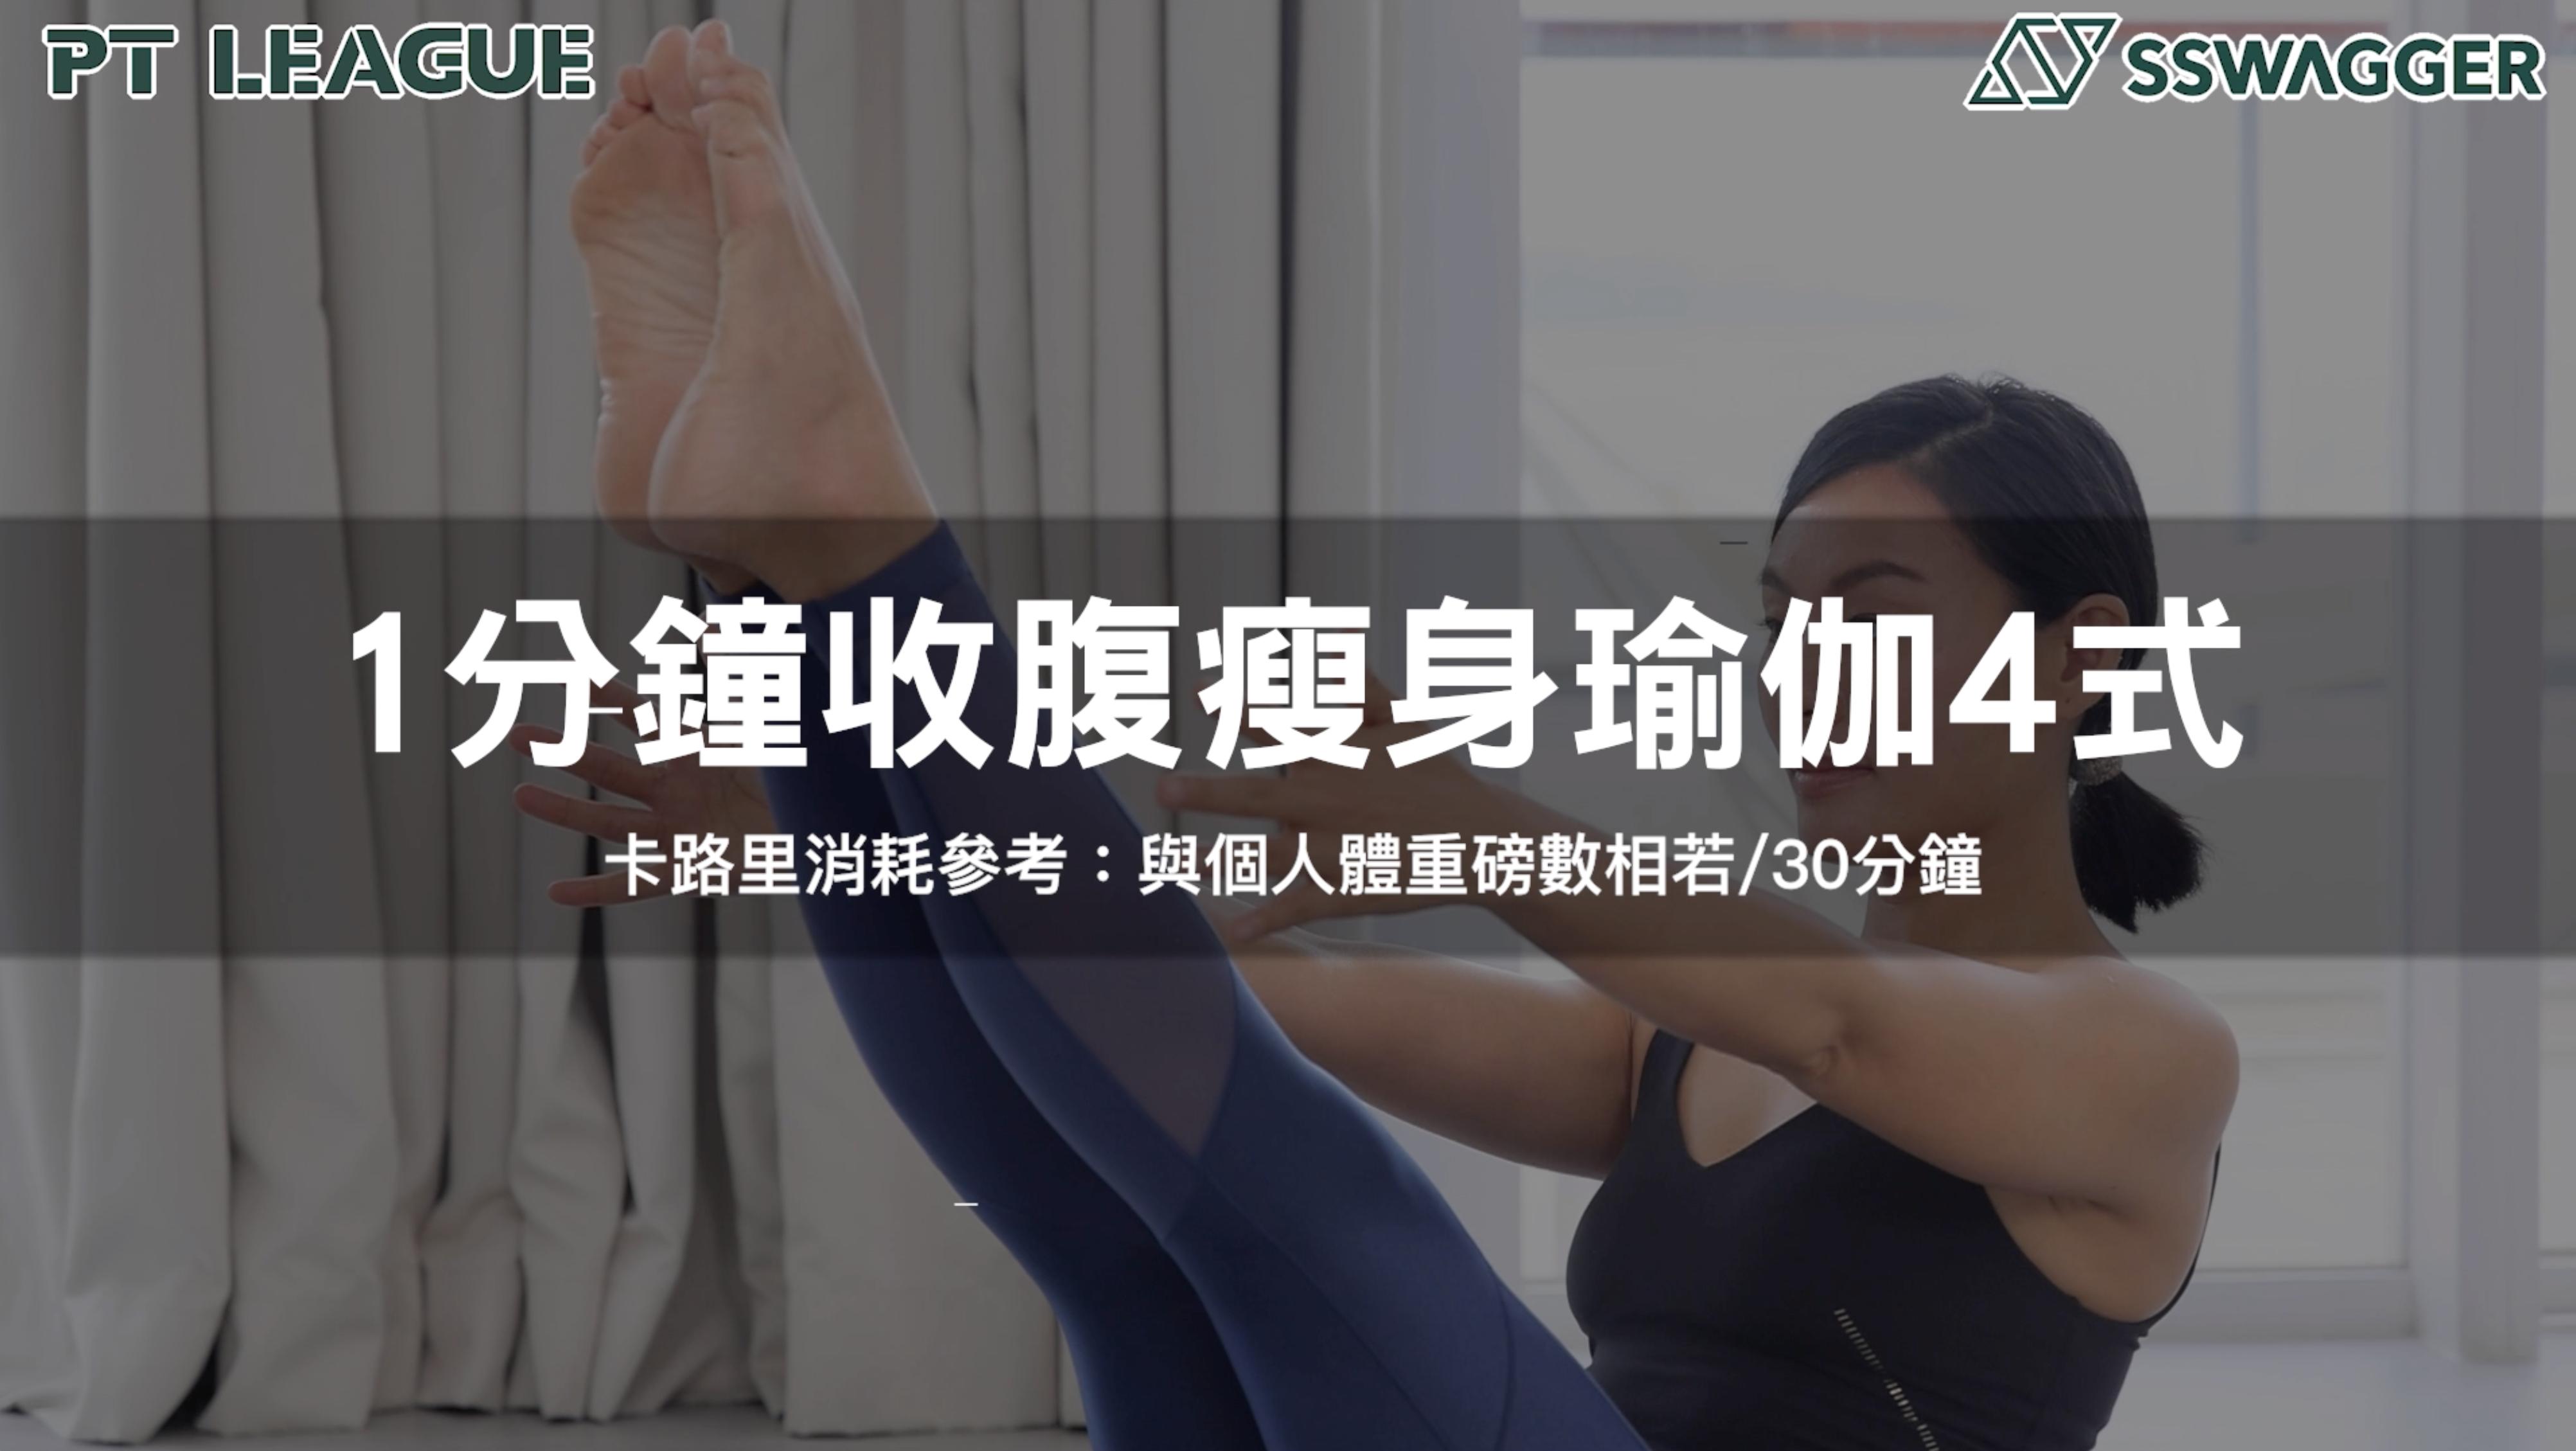 【SSwagger Academy - PT League】1分鐘收腹瘦身瑜伽4式